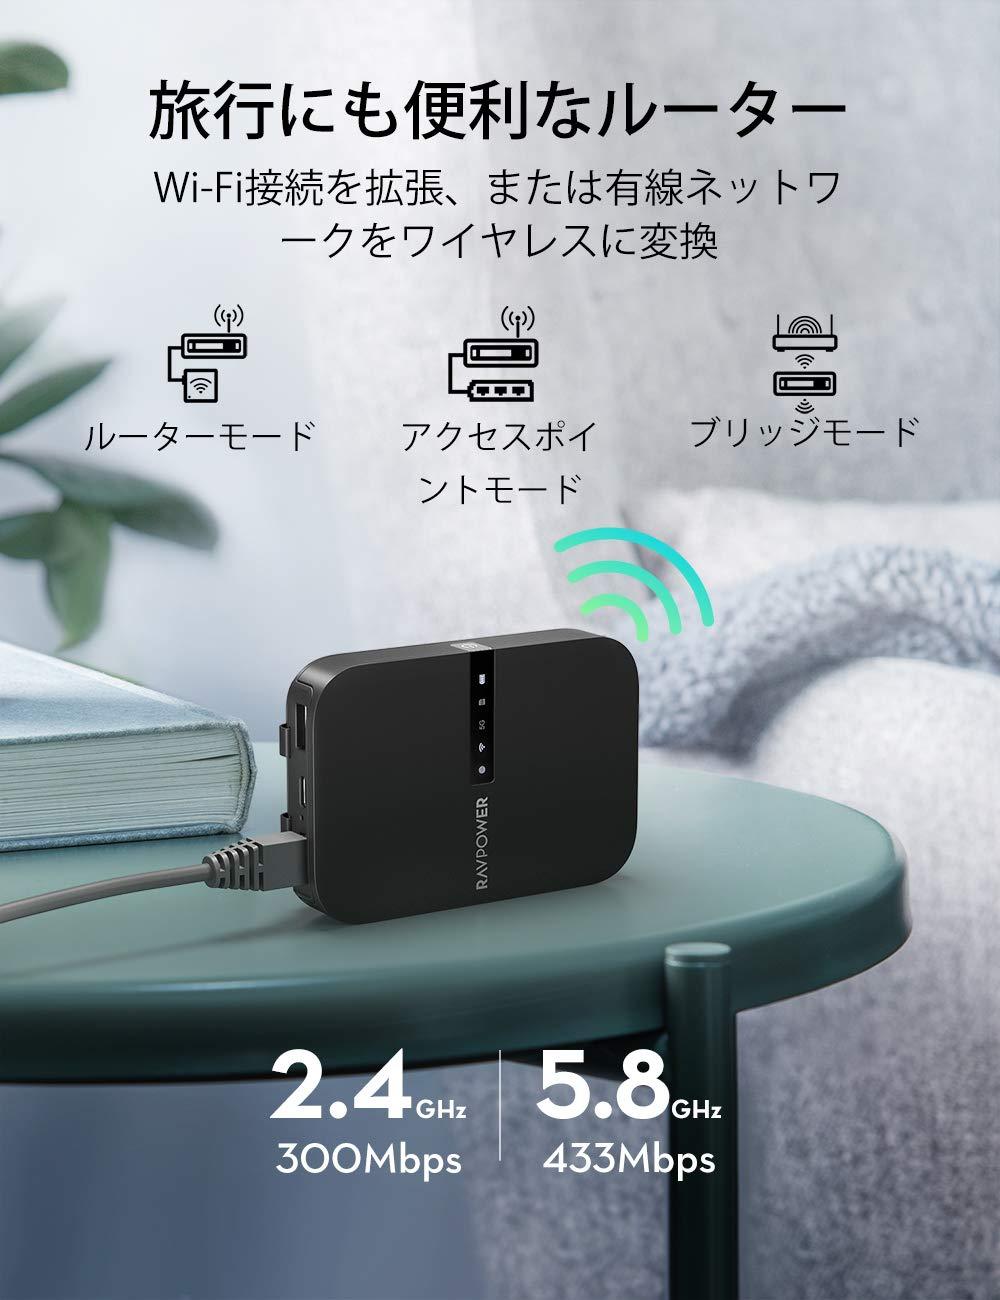 FileHub RP-WD009